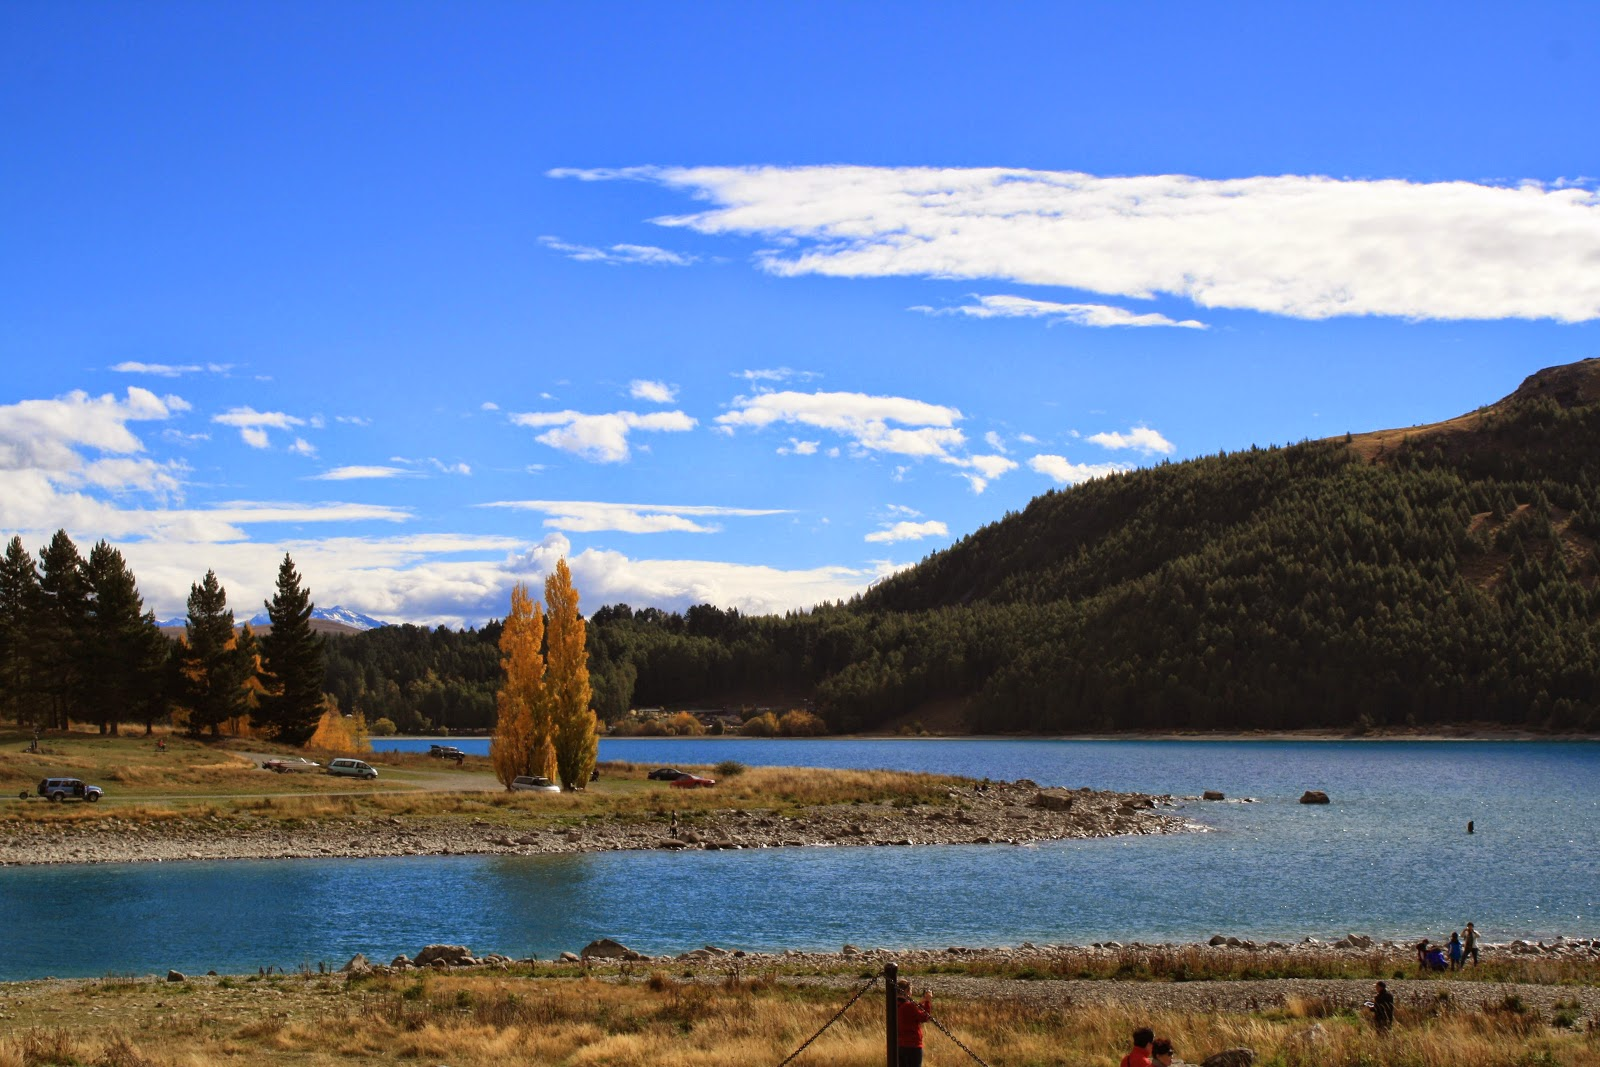 Orange trees, blue lake, blue sky.